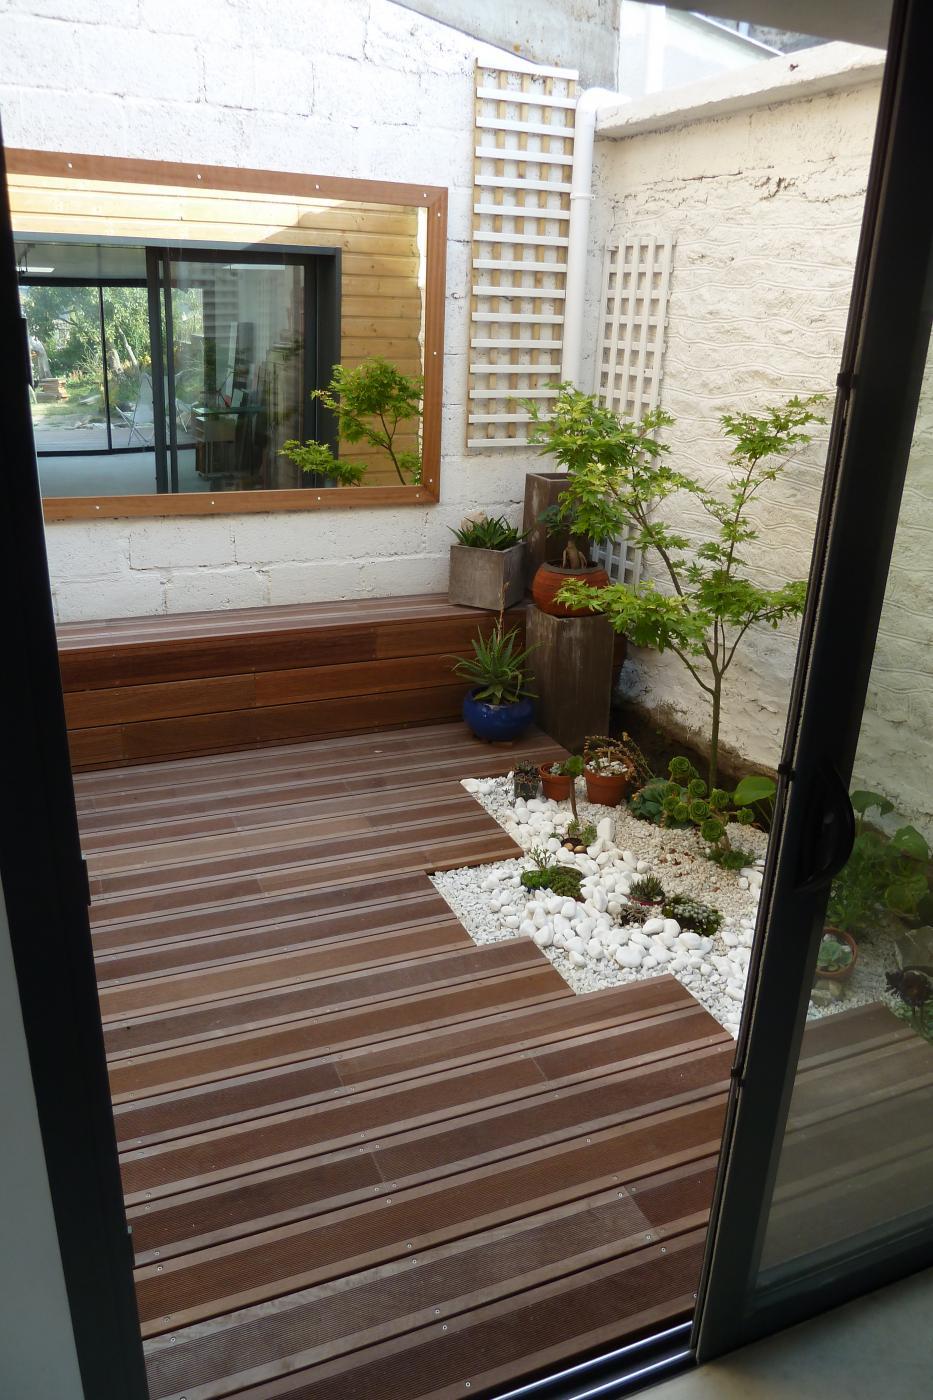 Accueil perrin menuiserie bois alu pvc charpente for Amenagement patio